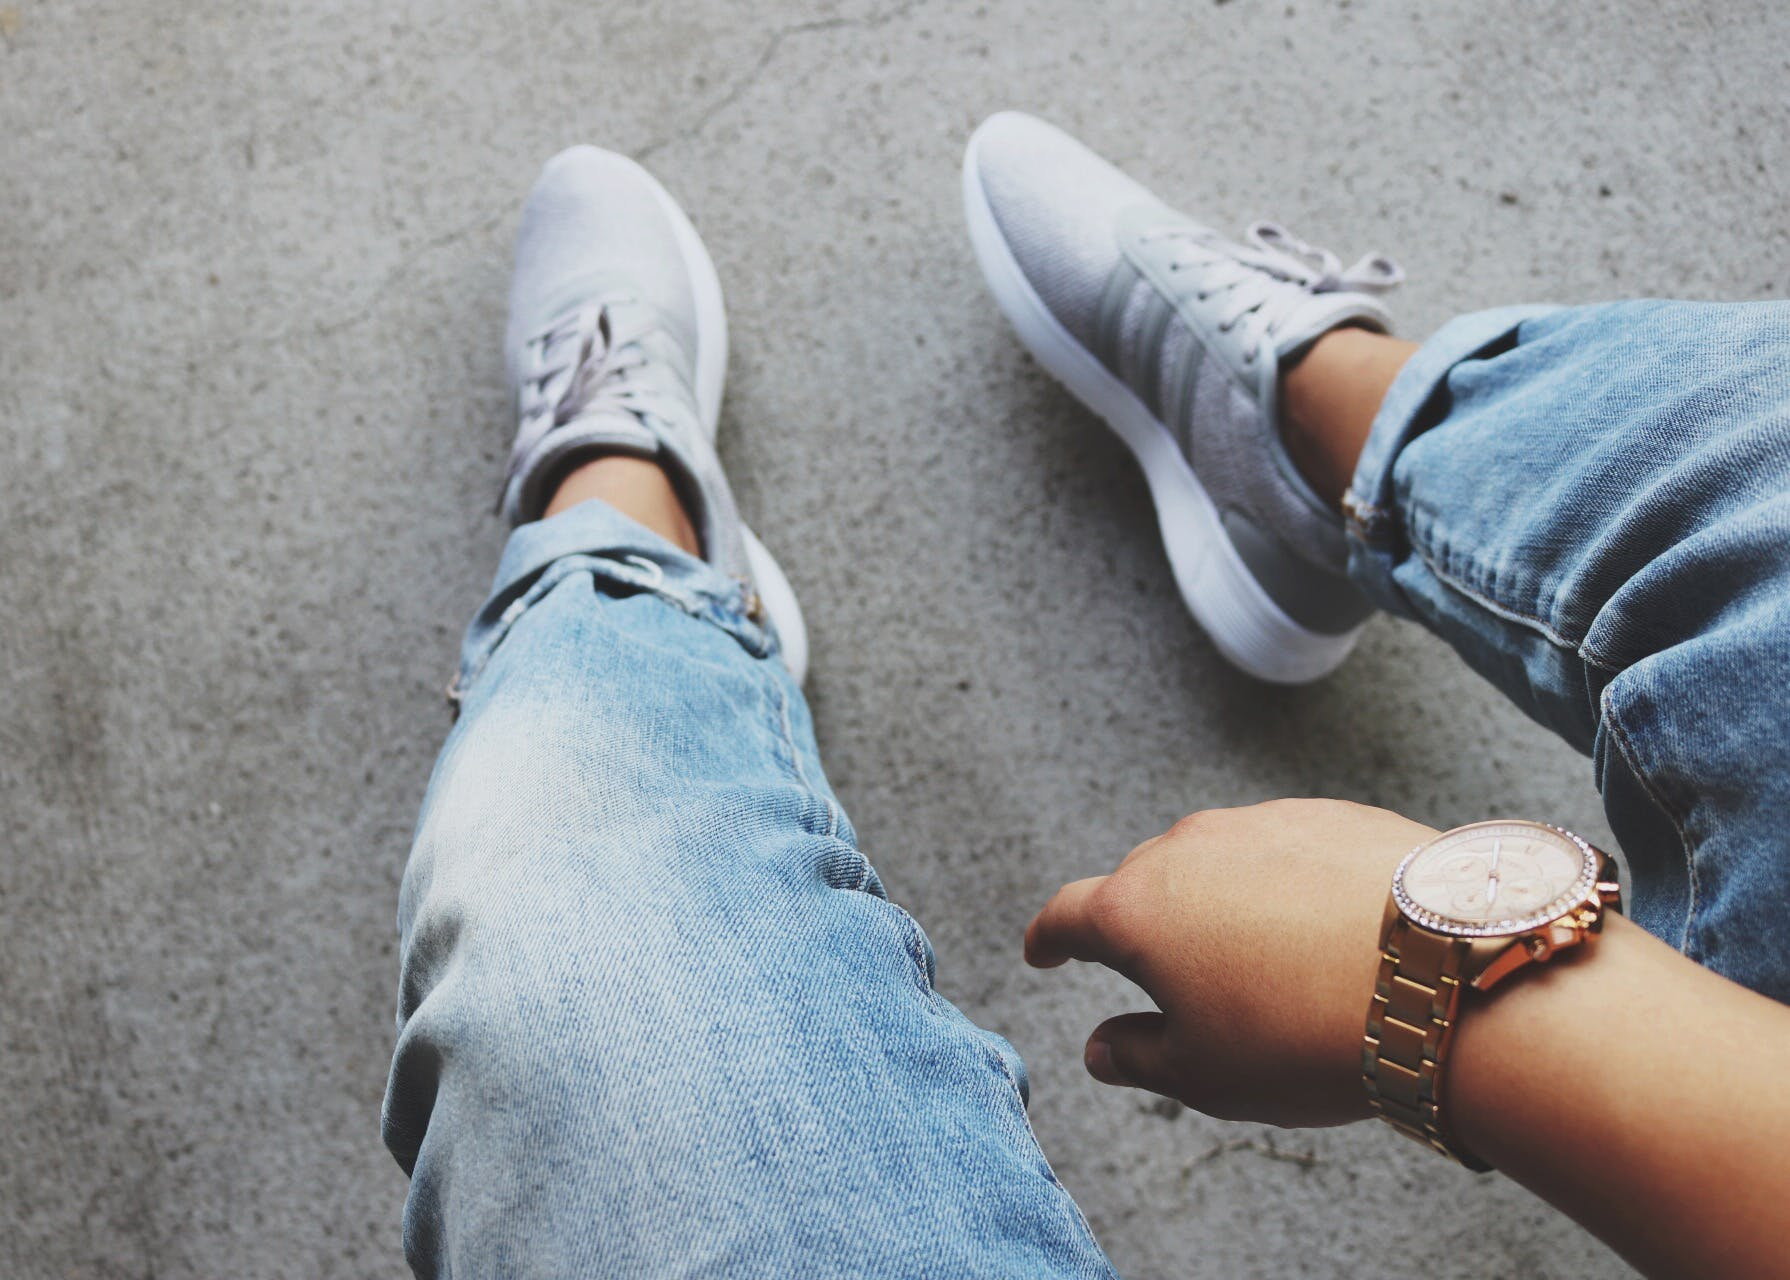 Grey Adidas Sneakers Near Blue Denim Bottoms